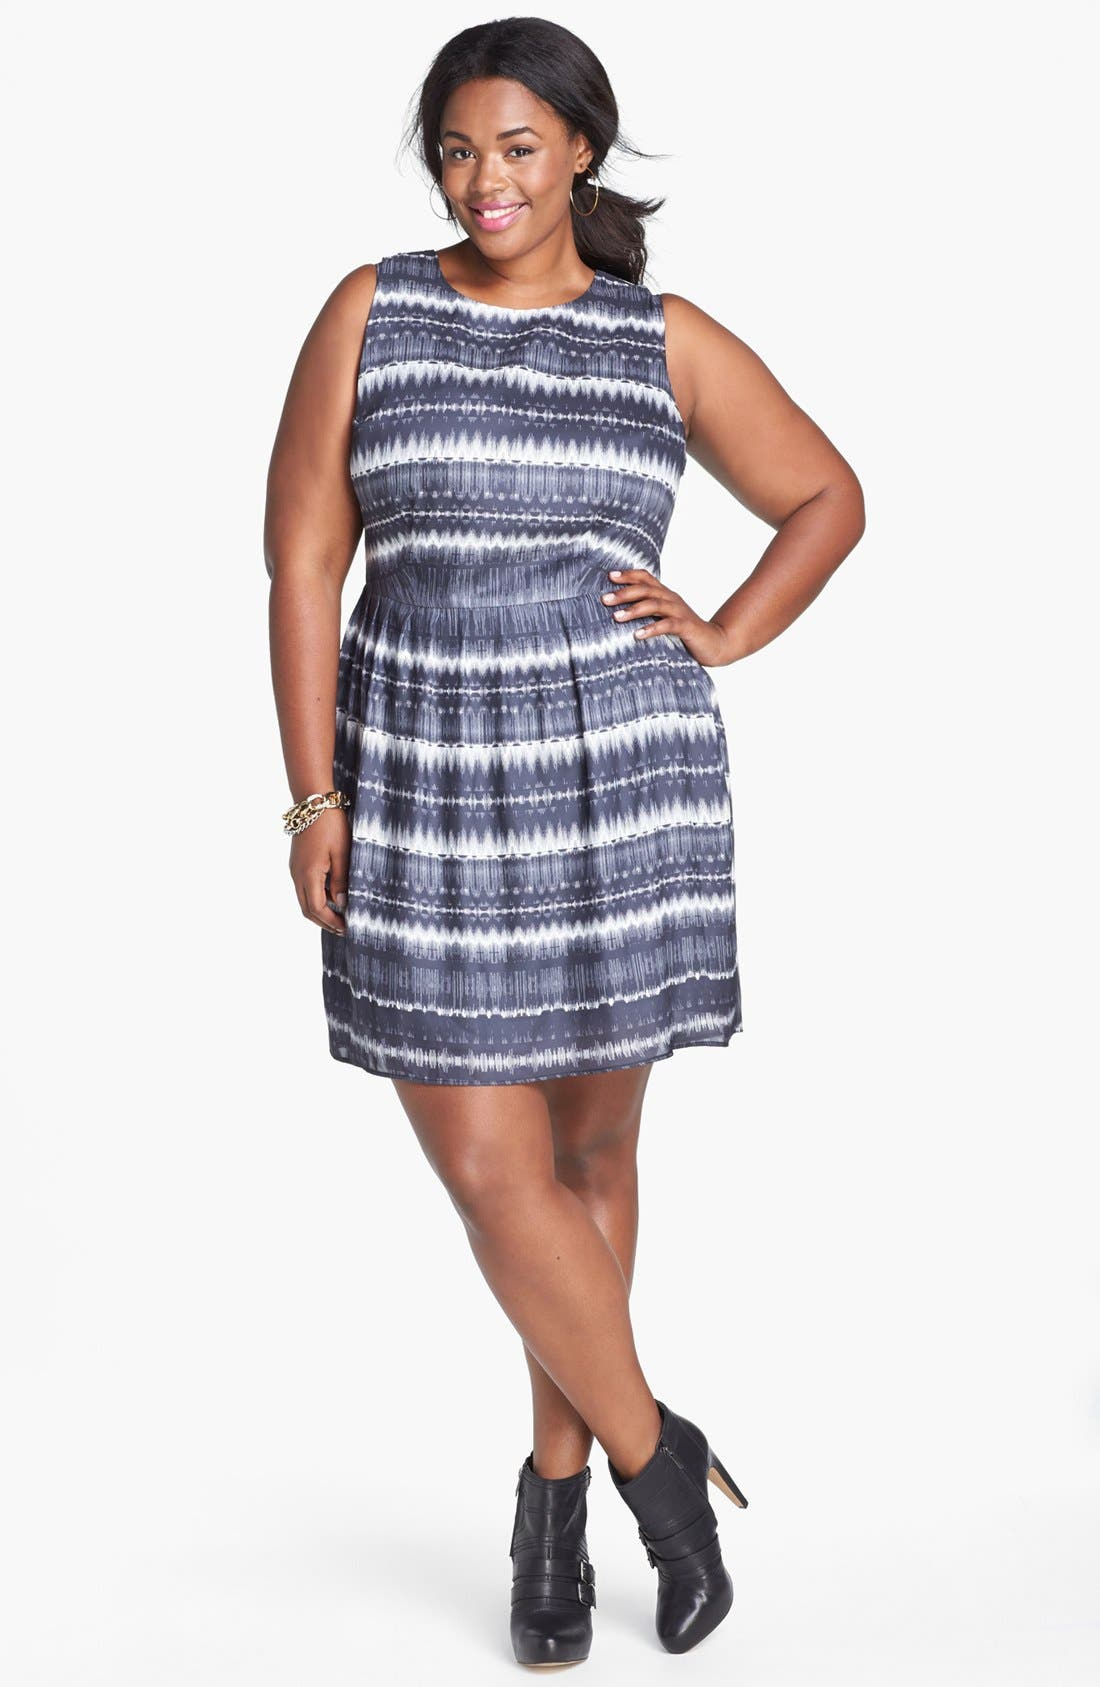 Alternate Image 1 Selected - BB Dakota 'Electricity' Print Crepe Fit & Flare Dress (Plus Size)